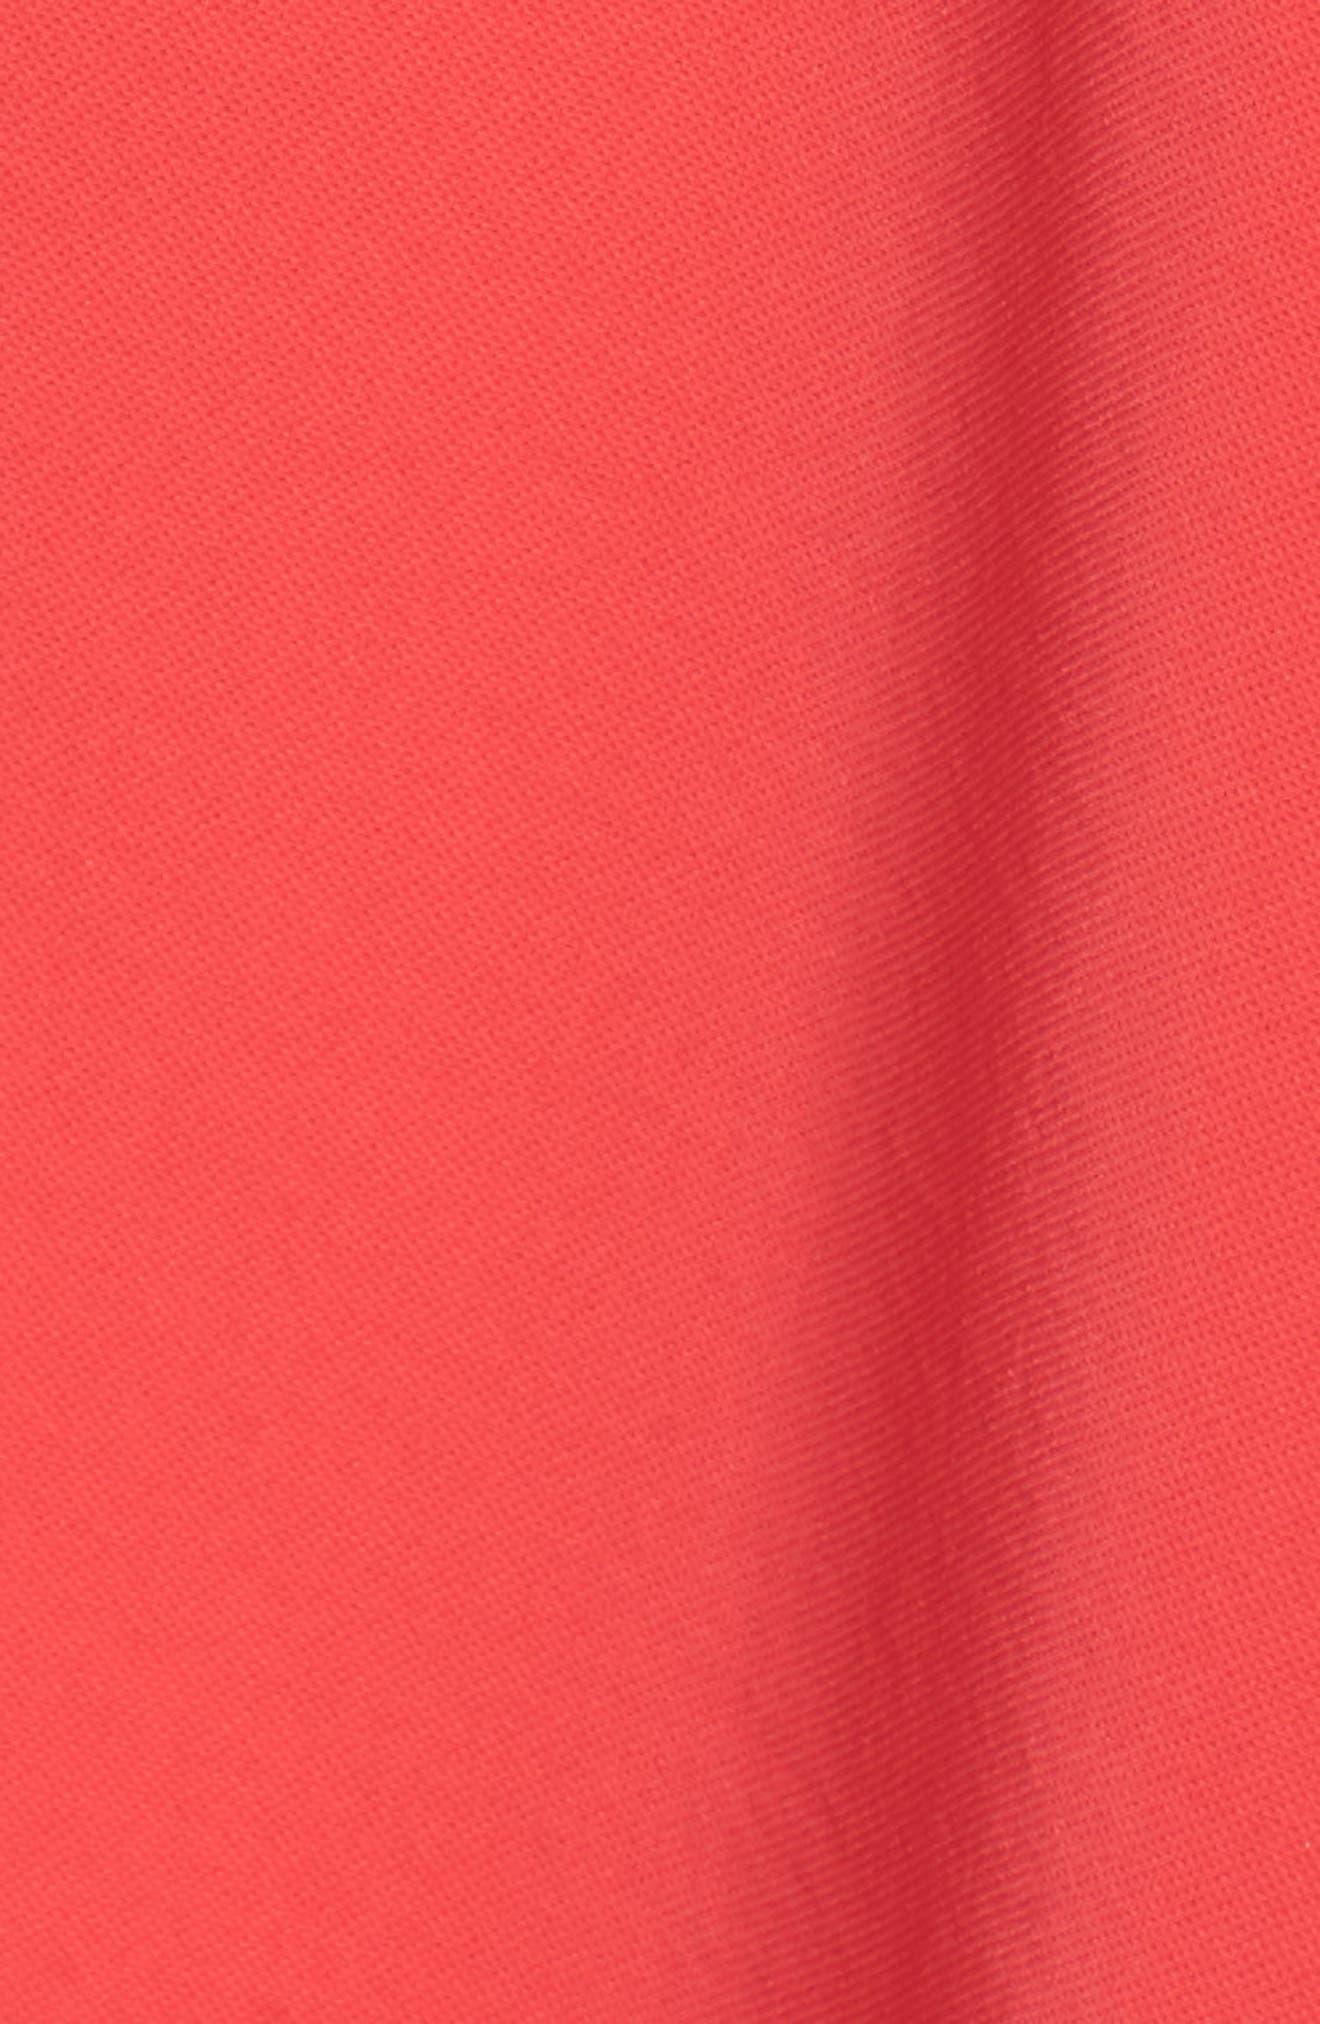 Off the Shoulder Crepe Dress,                             Alternate thumbnail 6, color,                             625